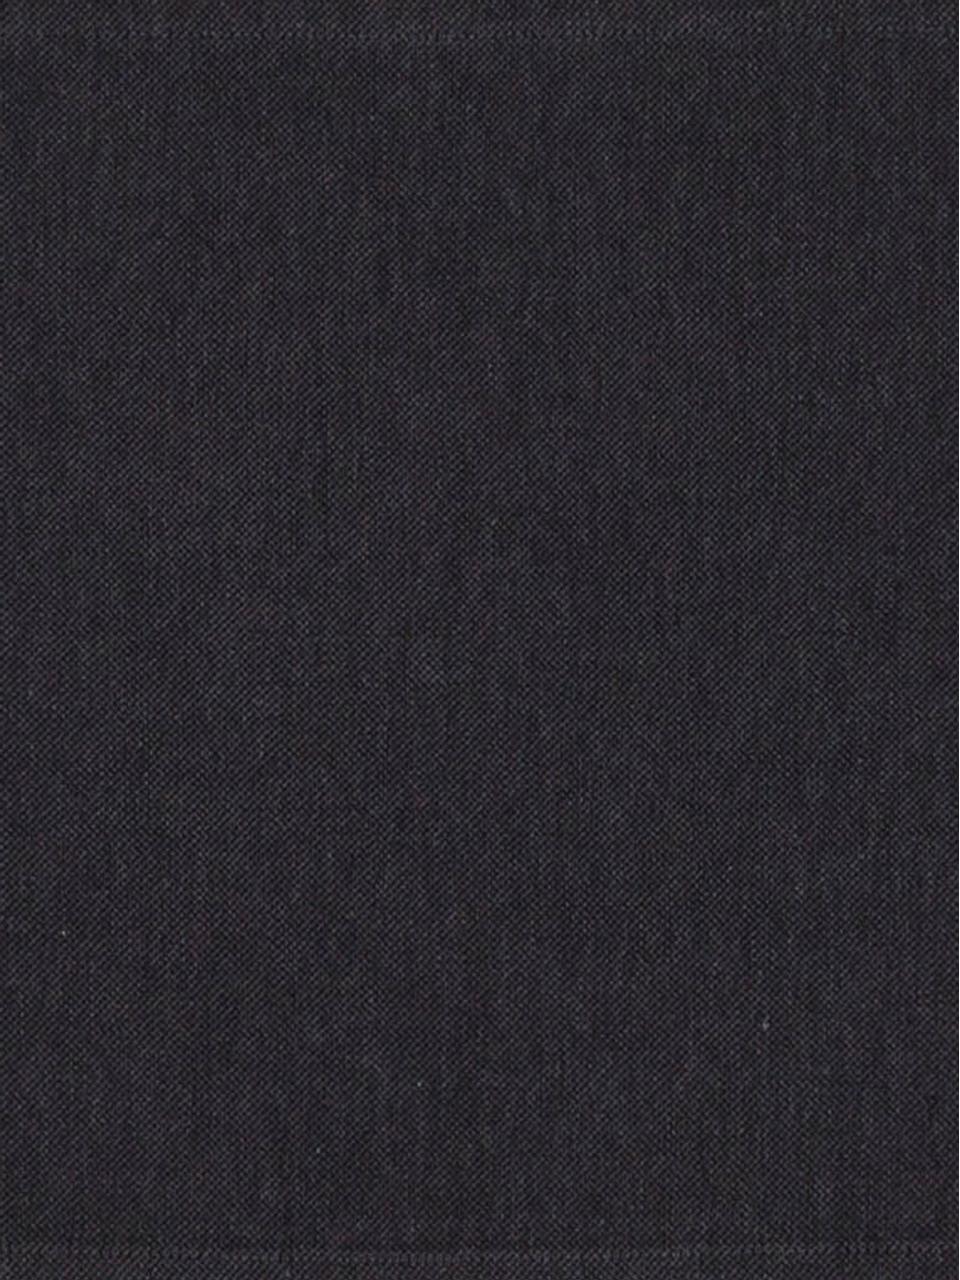 Tafelloper Riva van katoenmix in antraciet, 55%katoen, 45%polyester, Antraciet, 40 x 150 cm